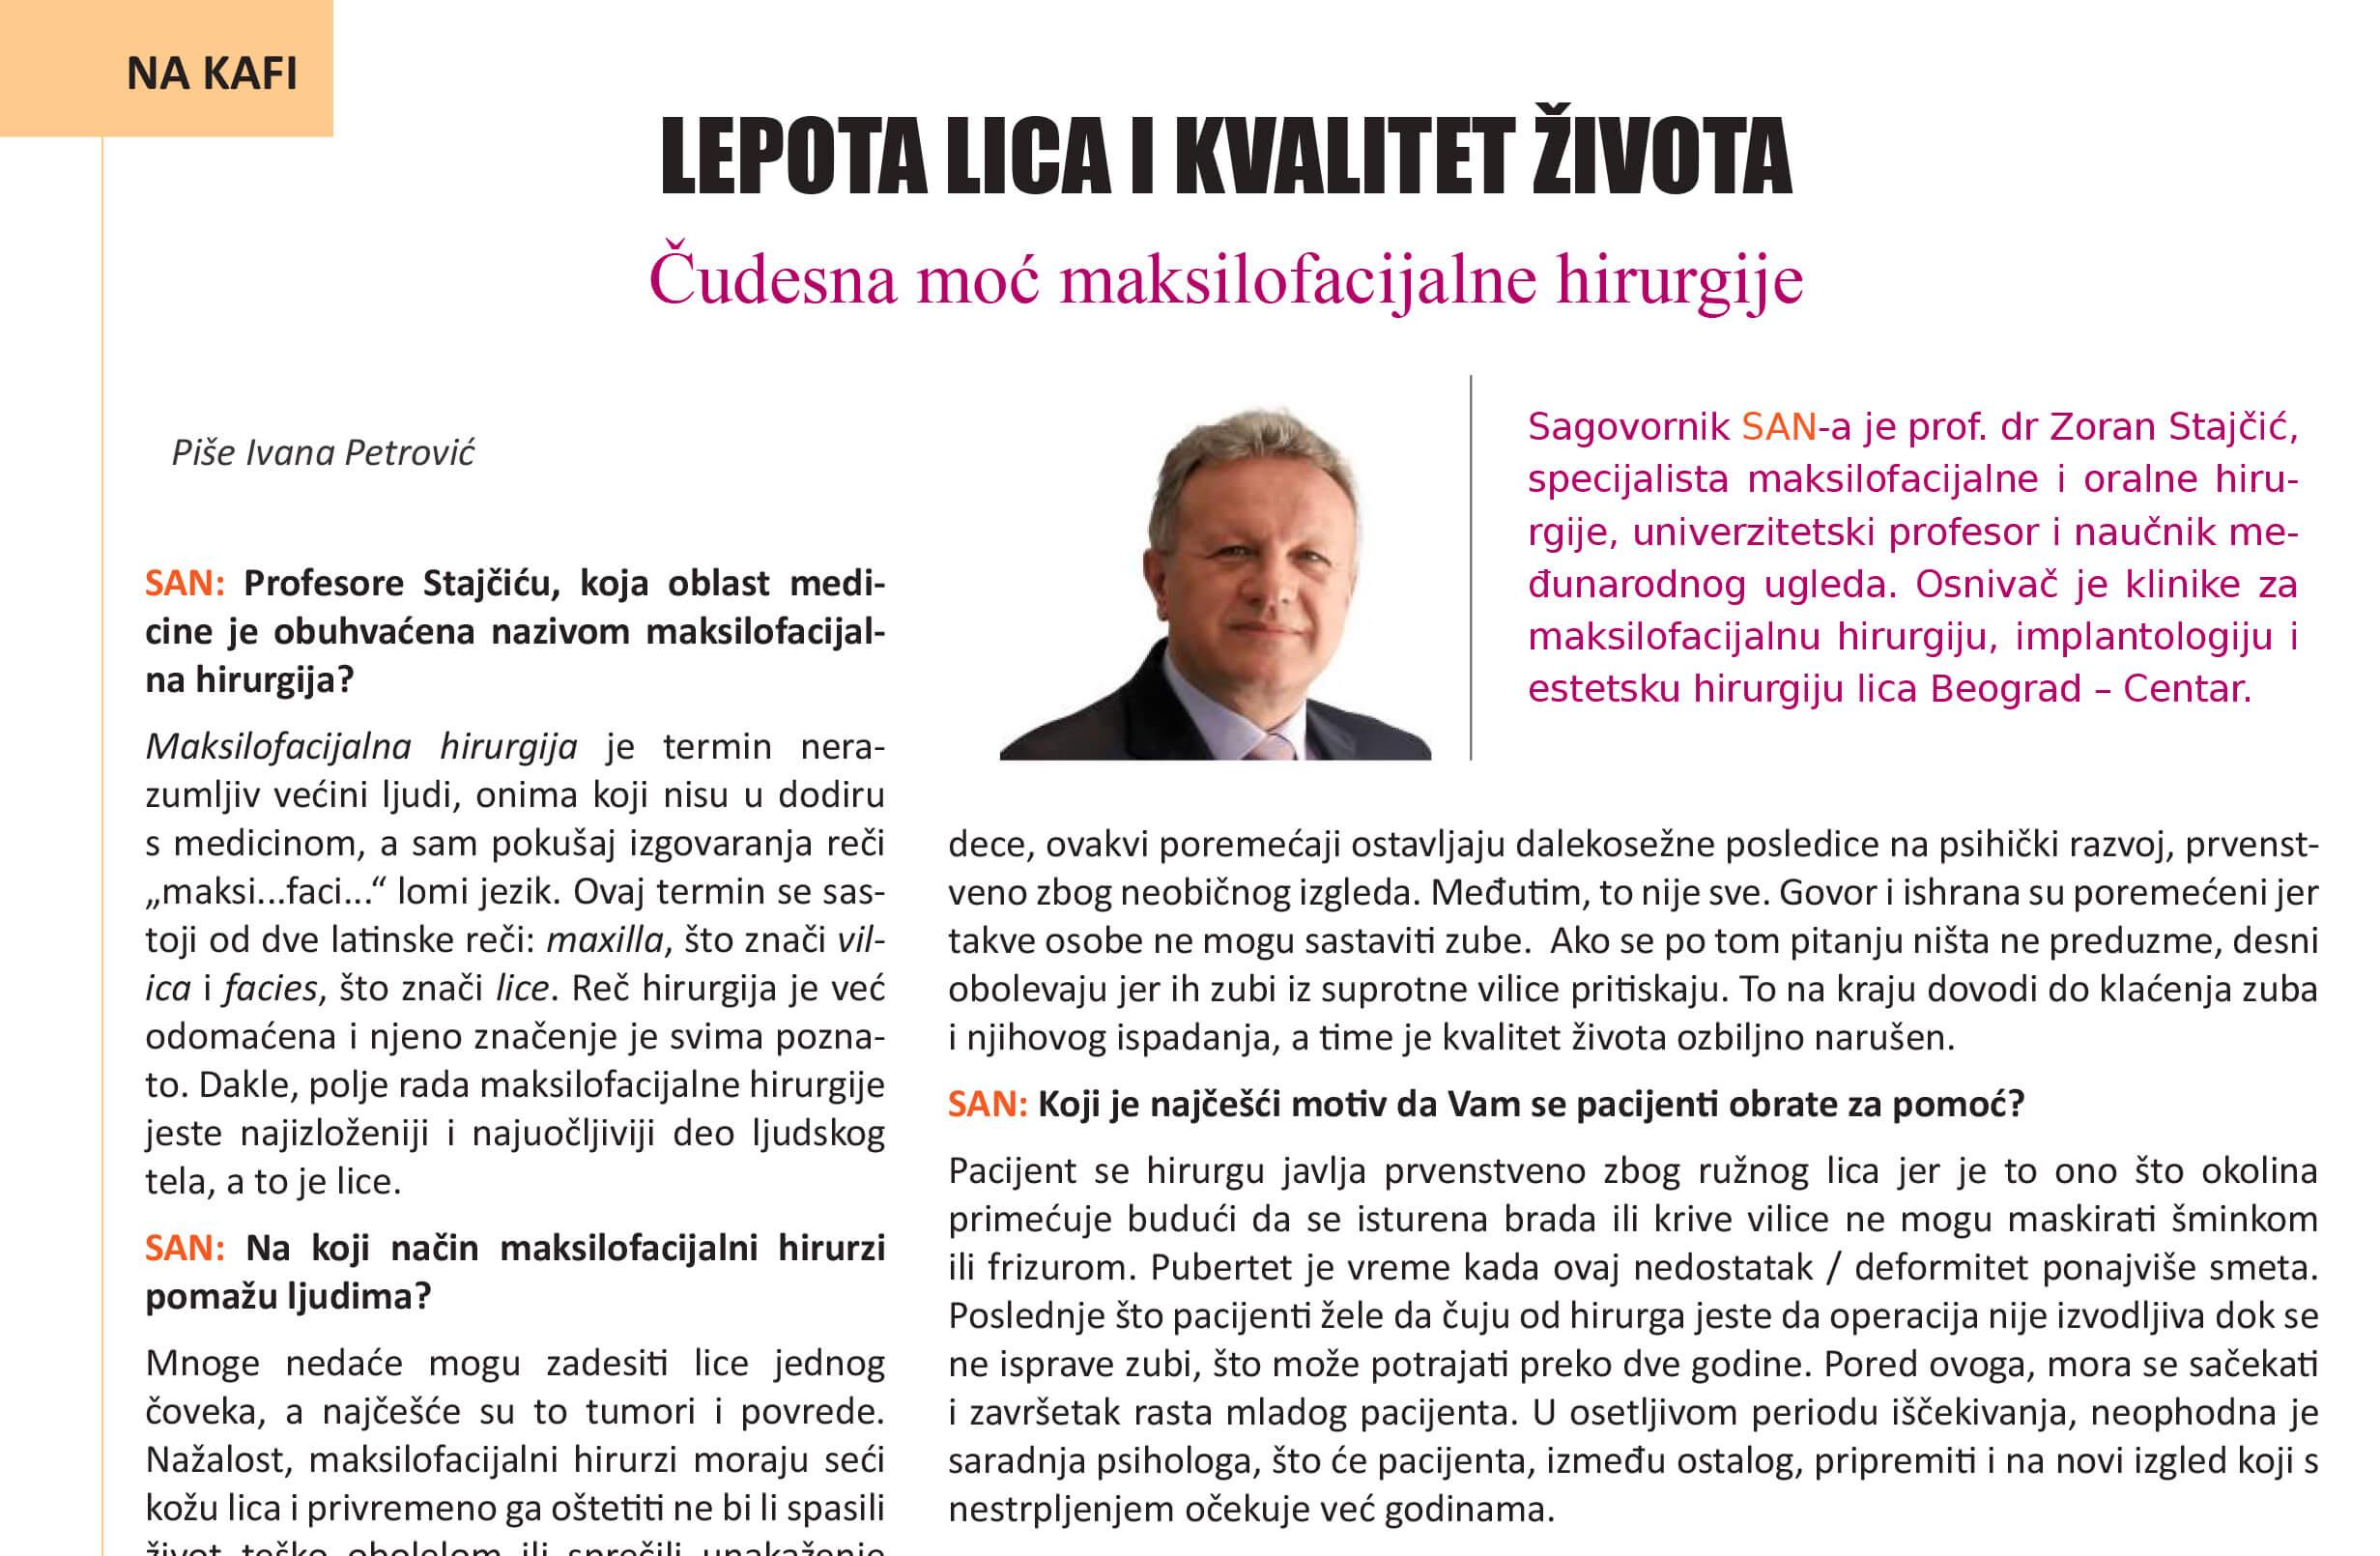 intervju profesor zoran stajcic hirurgija oralna kanada magazin